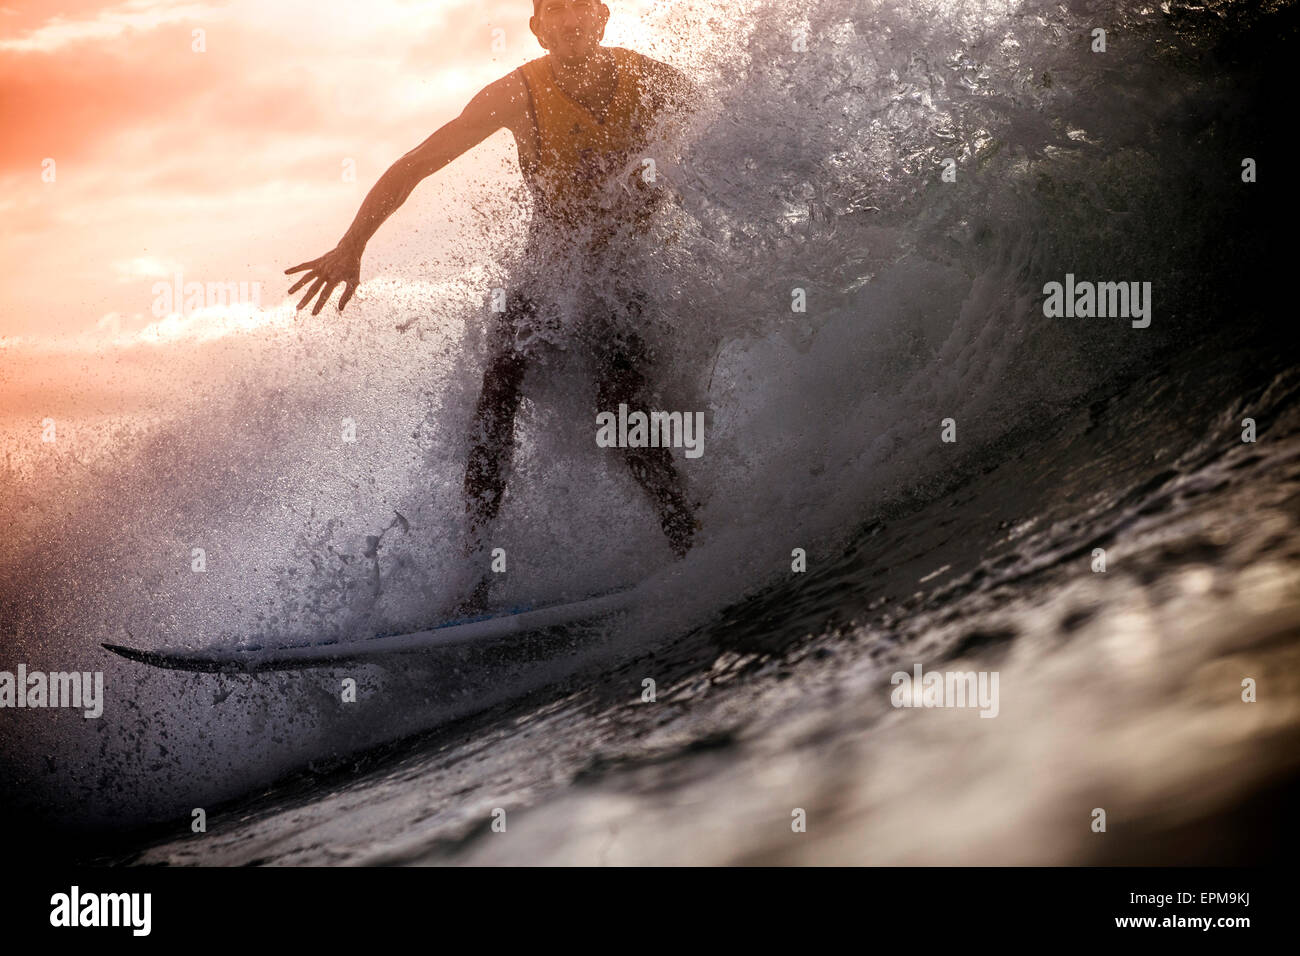 Indonesien, Insel Lombok, Surfen Mann am Hintergrundbeleuchtung Stockbild